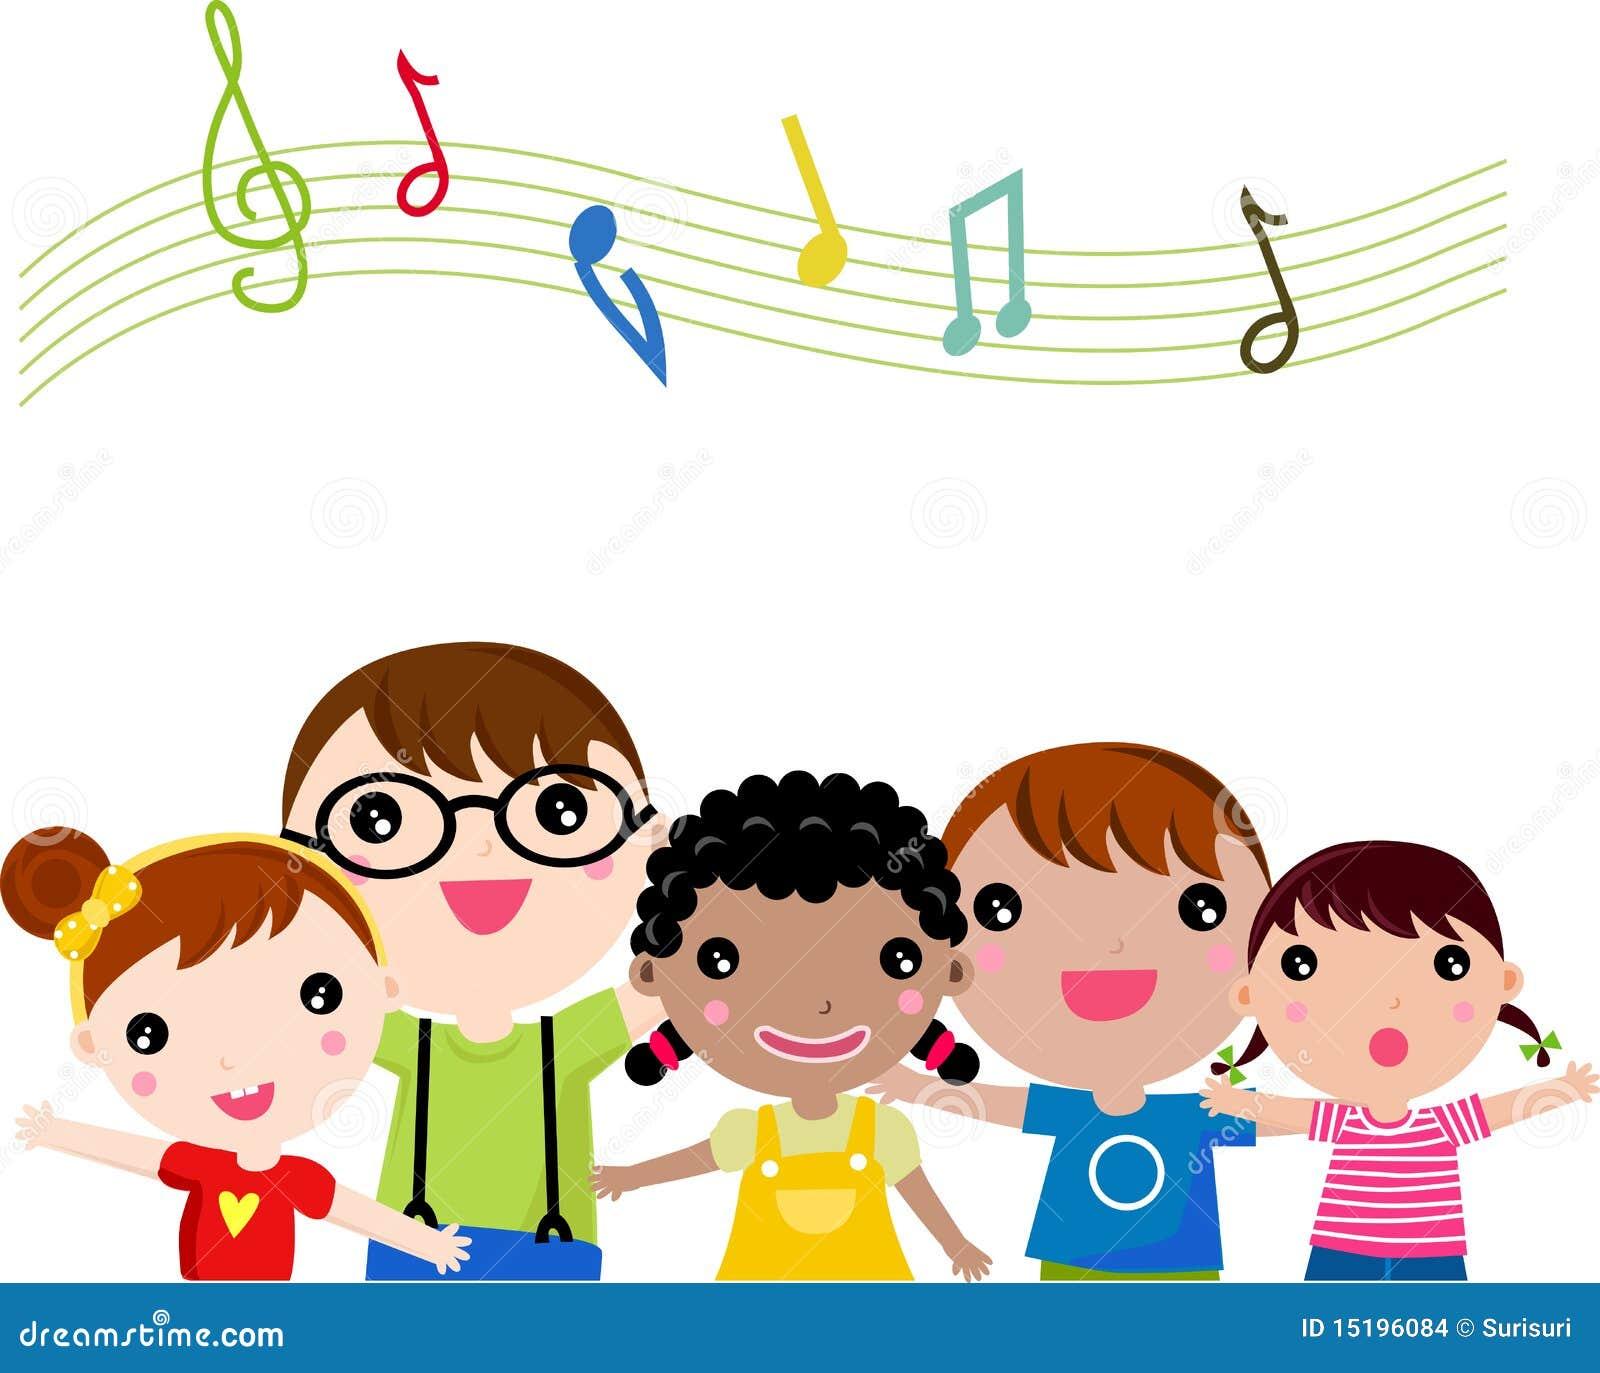 child singer clipart - photo #34